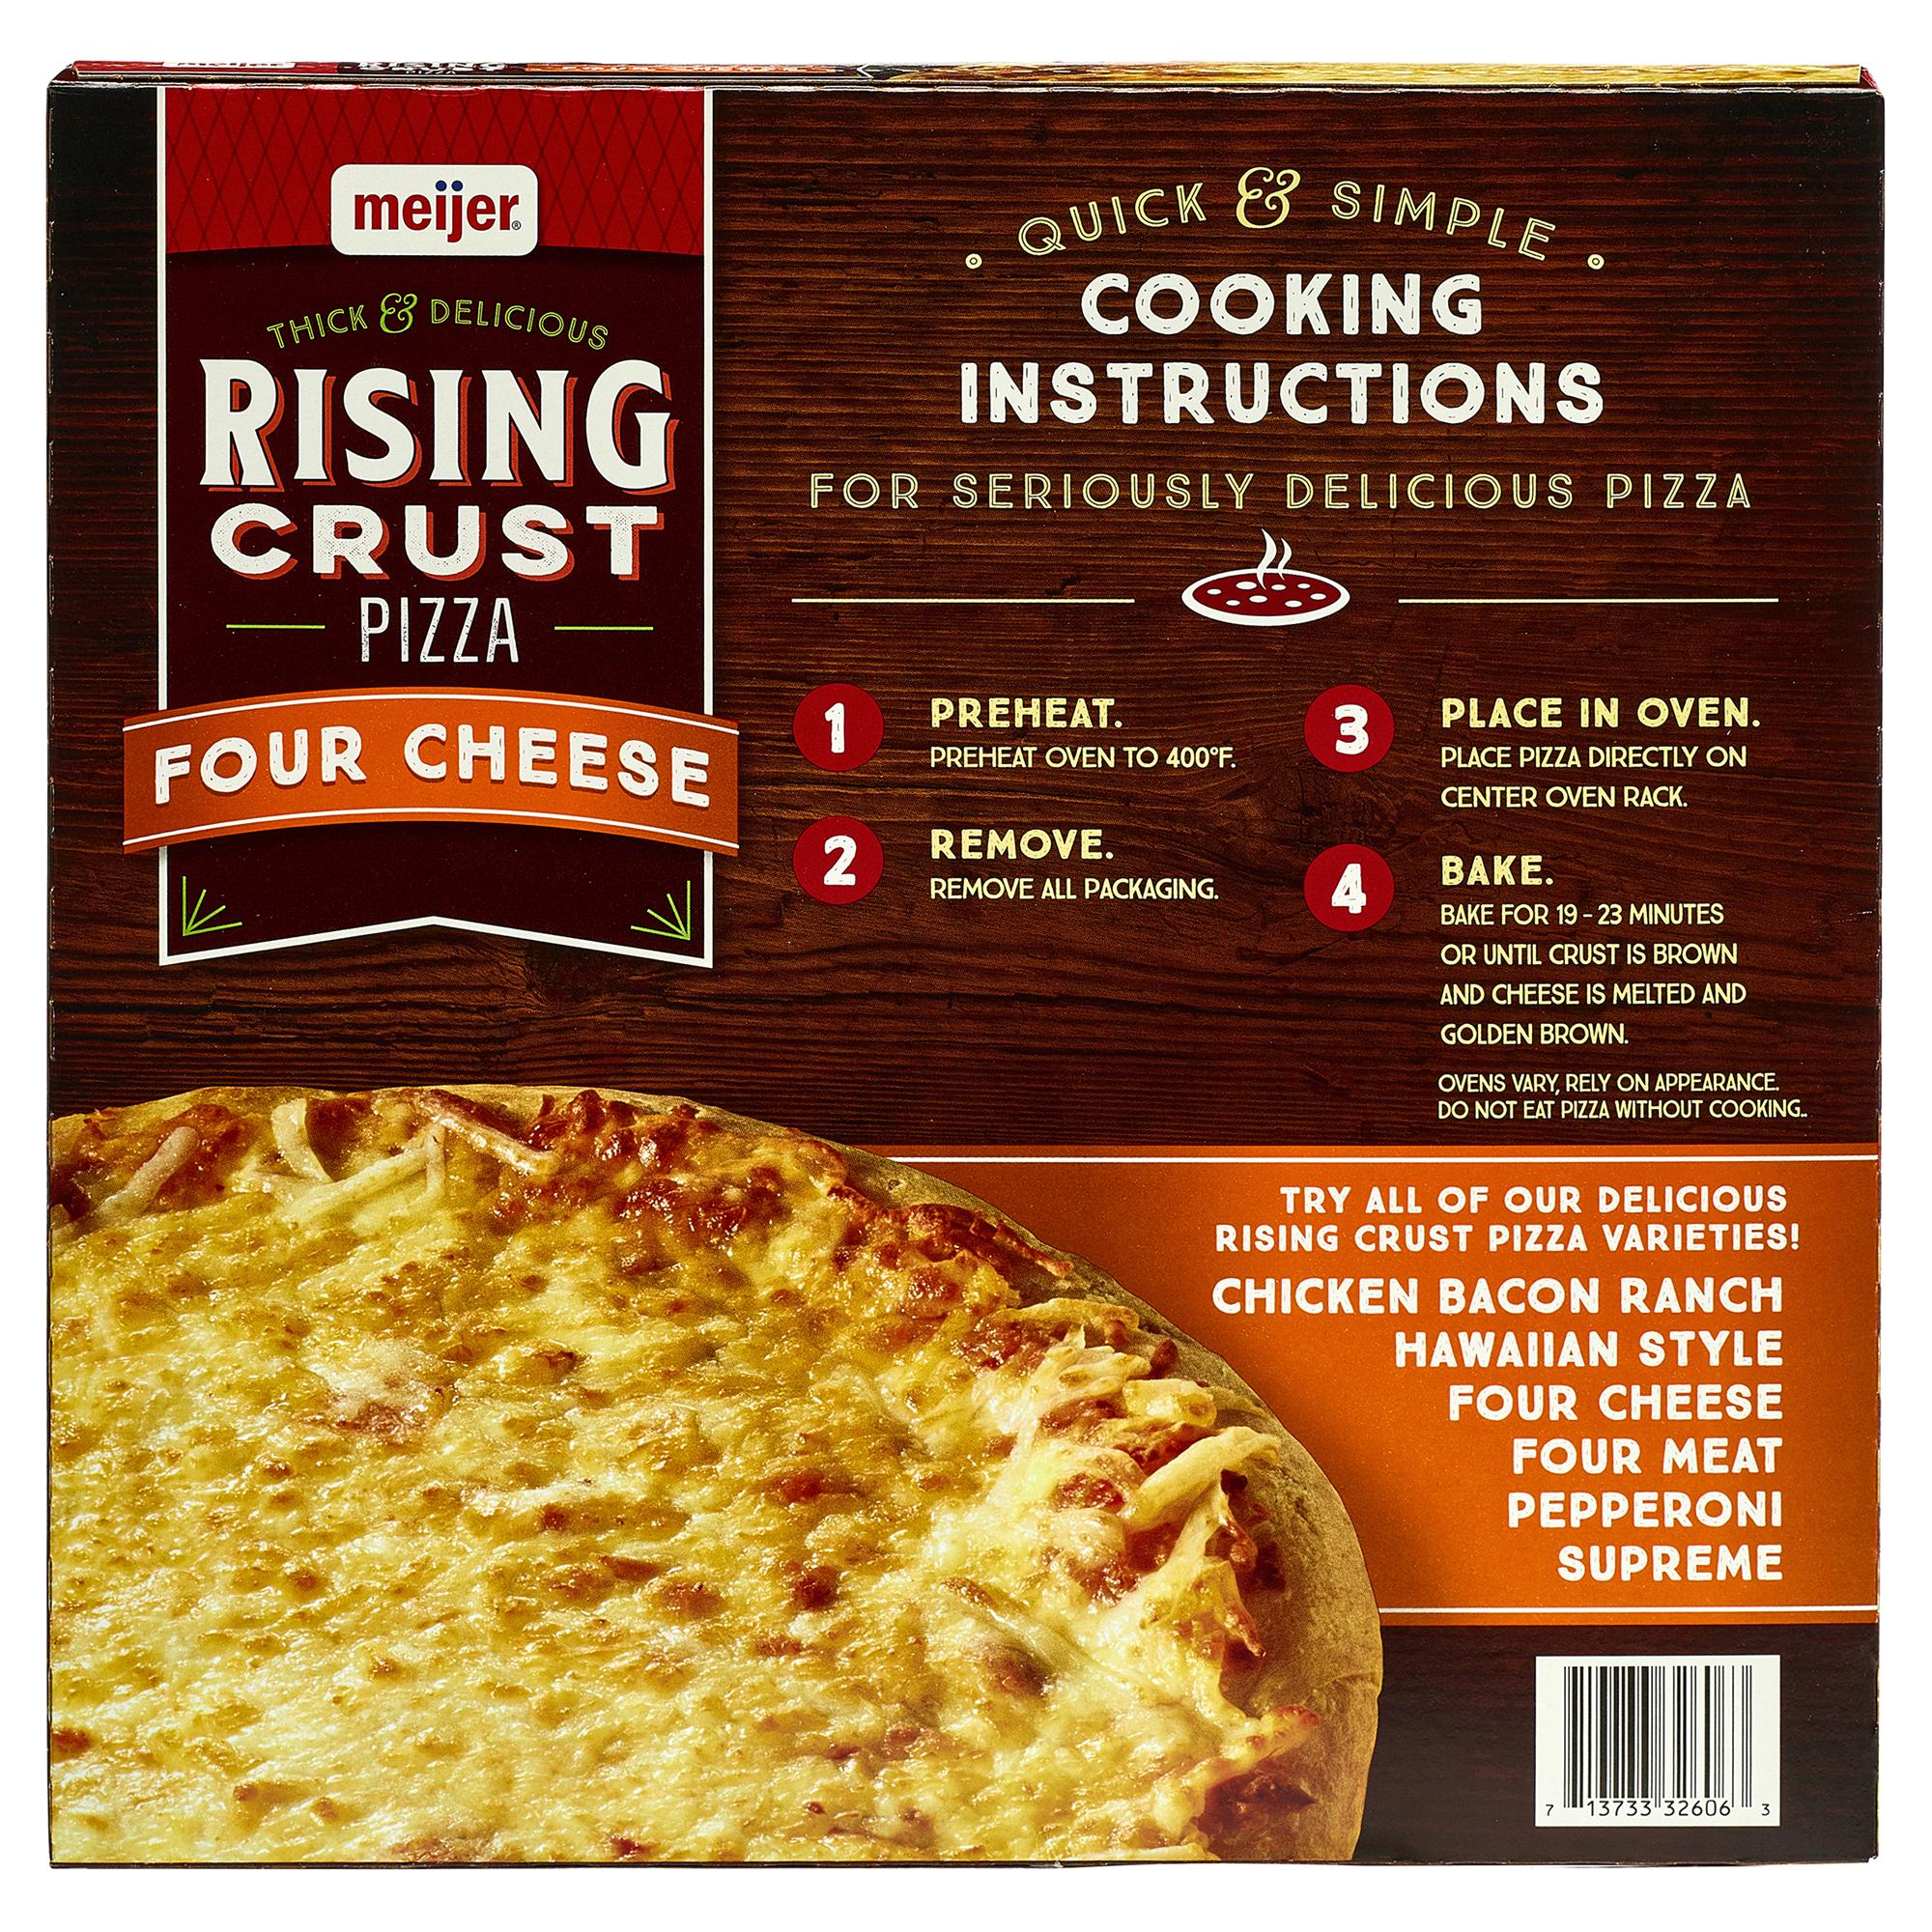 Meijer Rising Crust Four Cheese Pizza 28.2 oz. | Meijer.com